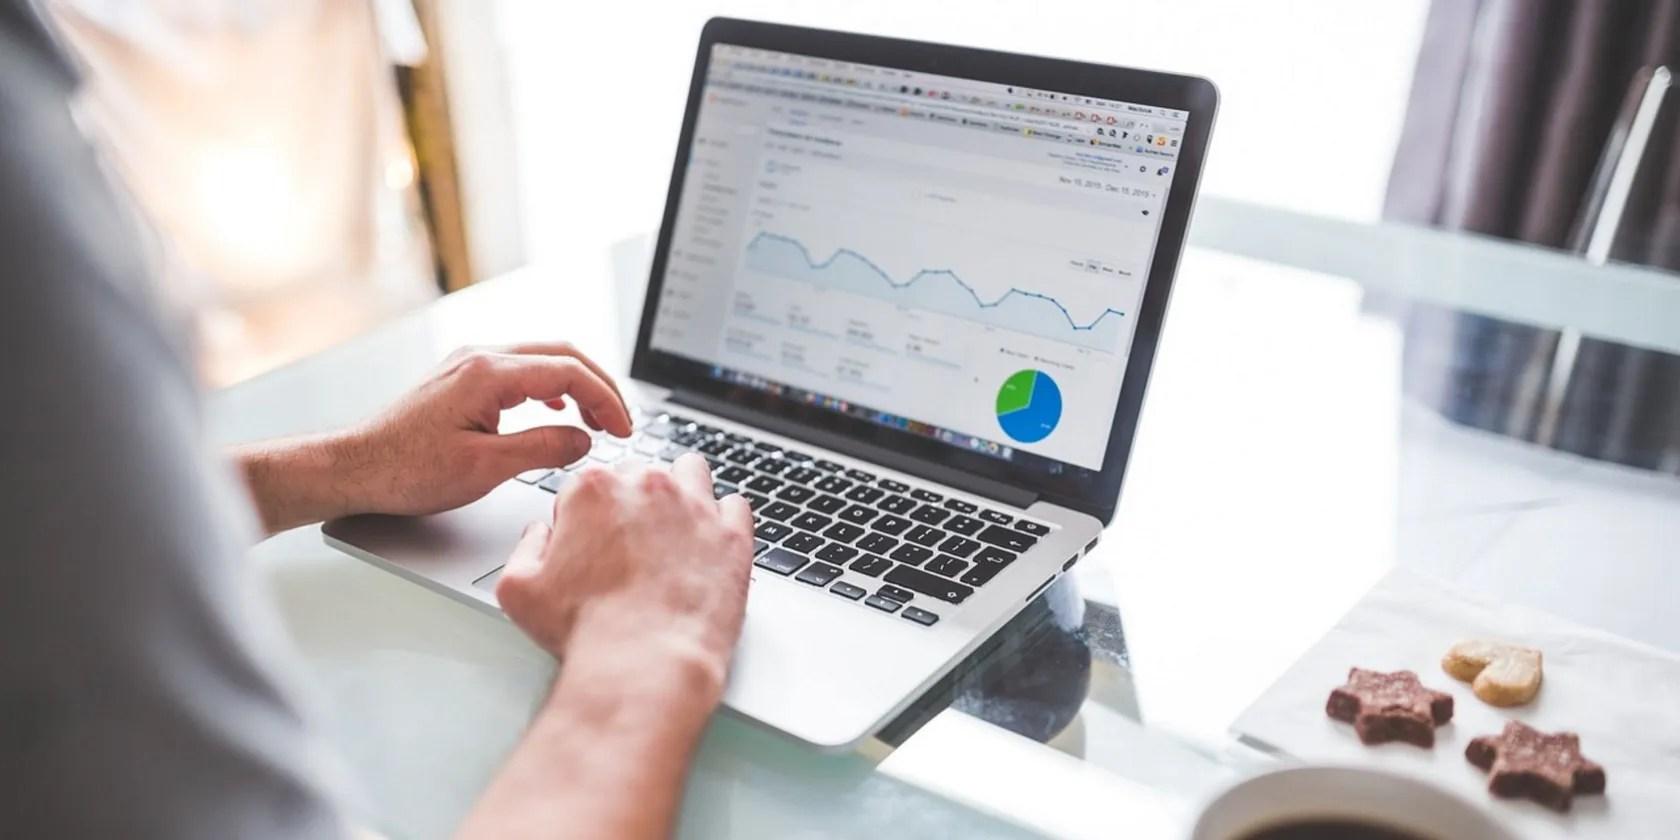 The 7 Most Effective WordPress SEO Plugins - MakeUseOf